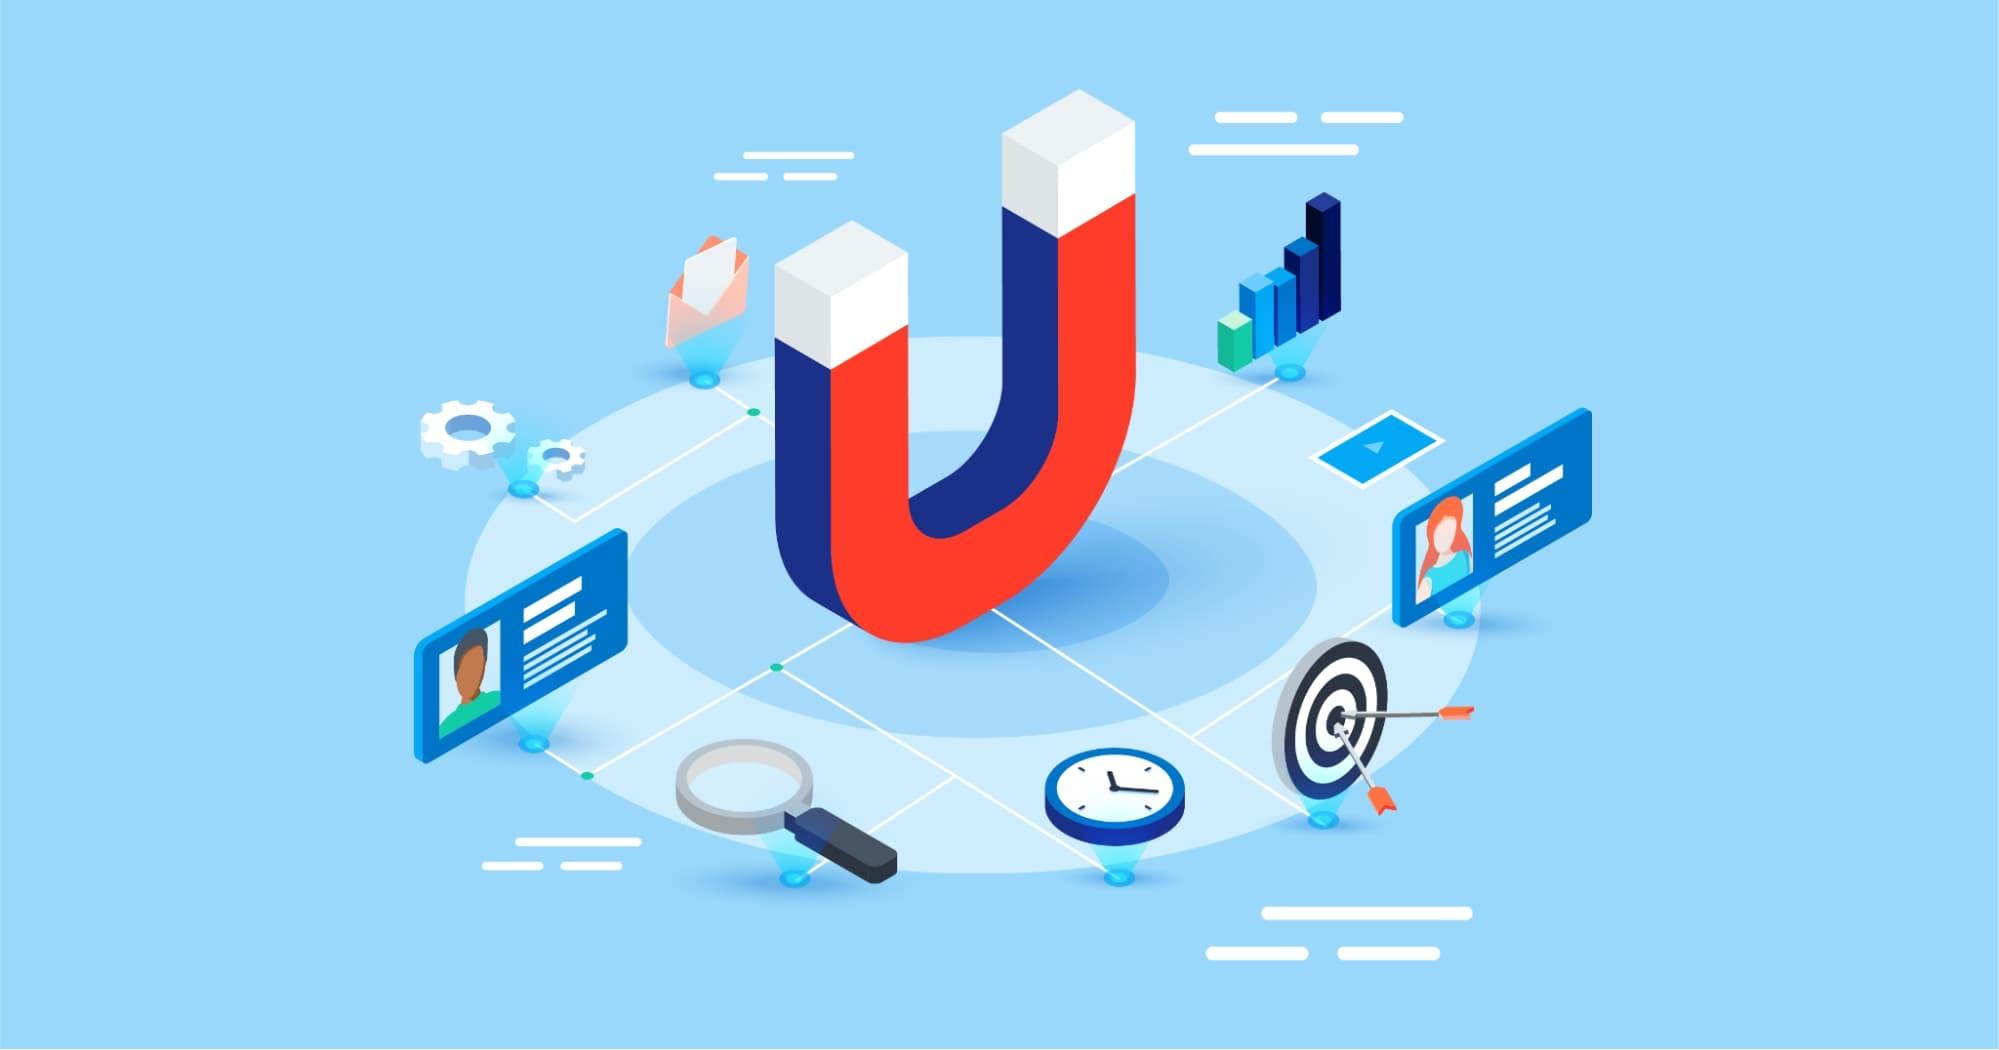 Benefits of using a partnership marketing strategy